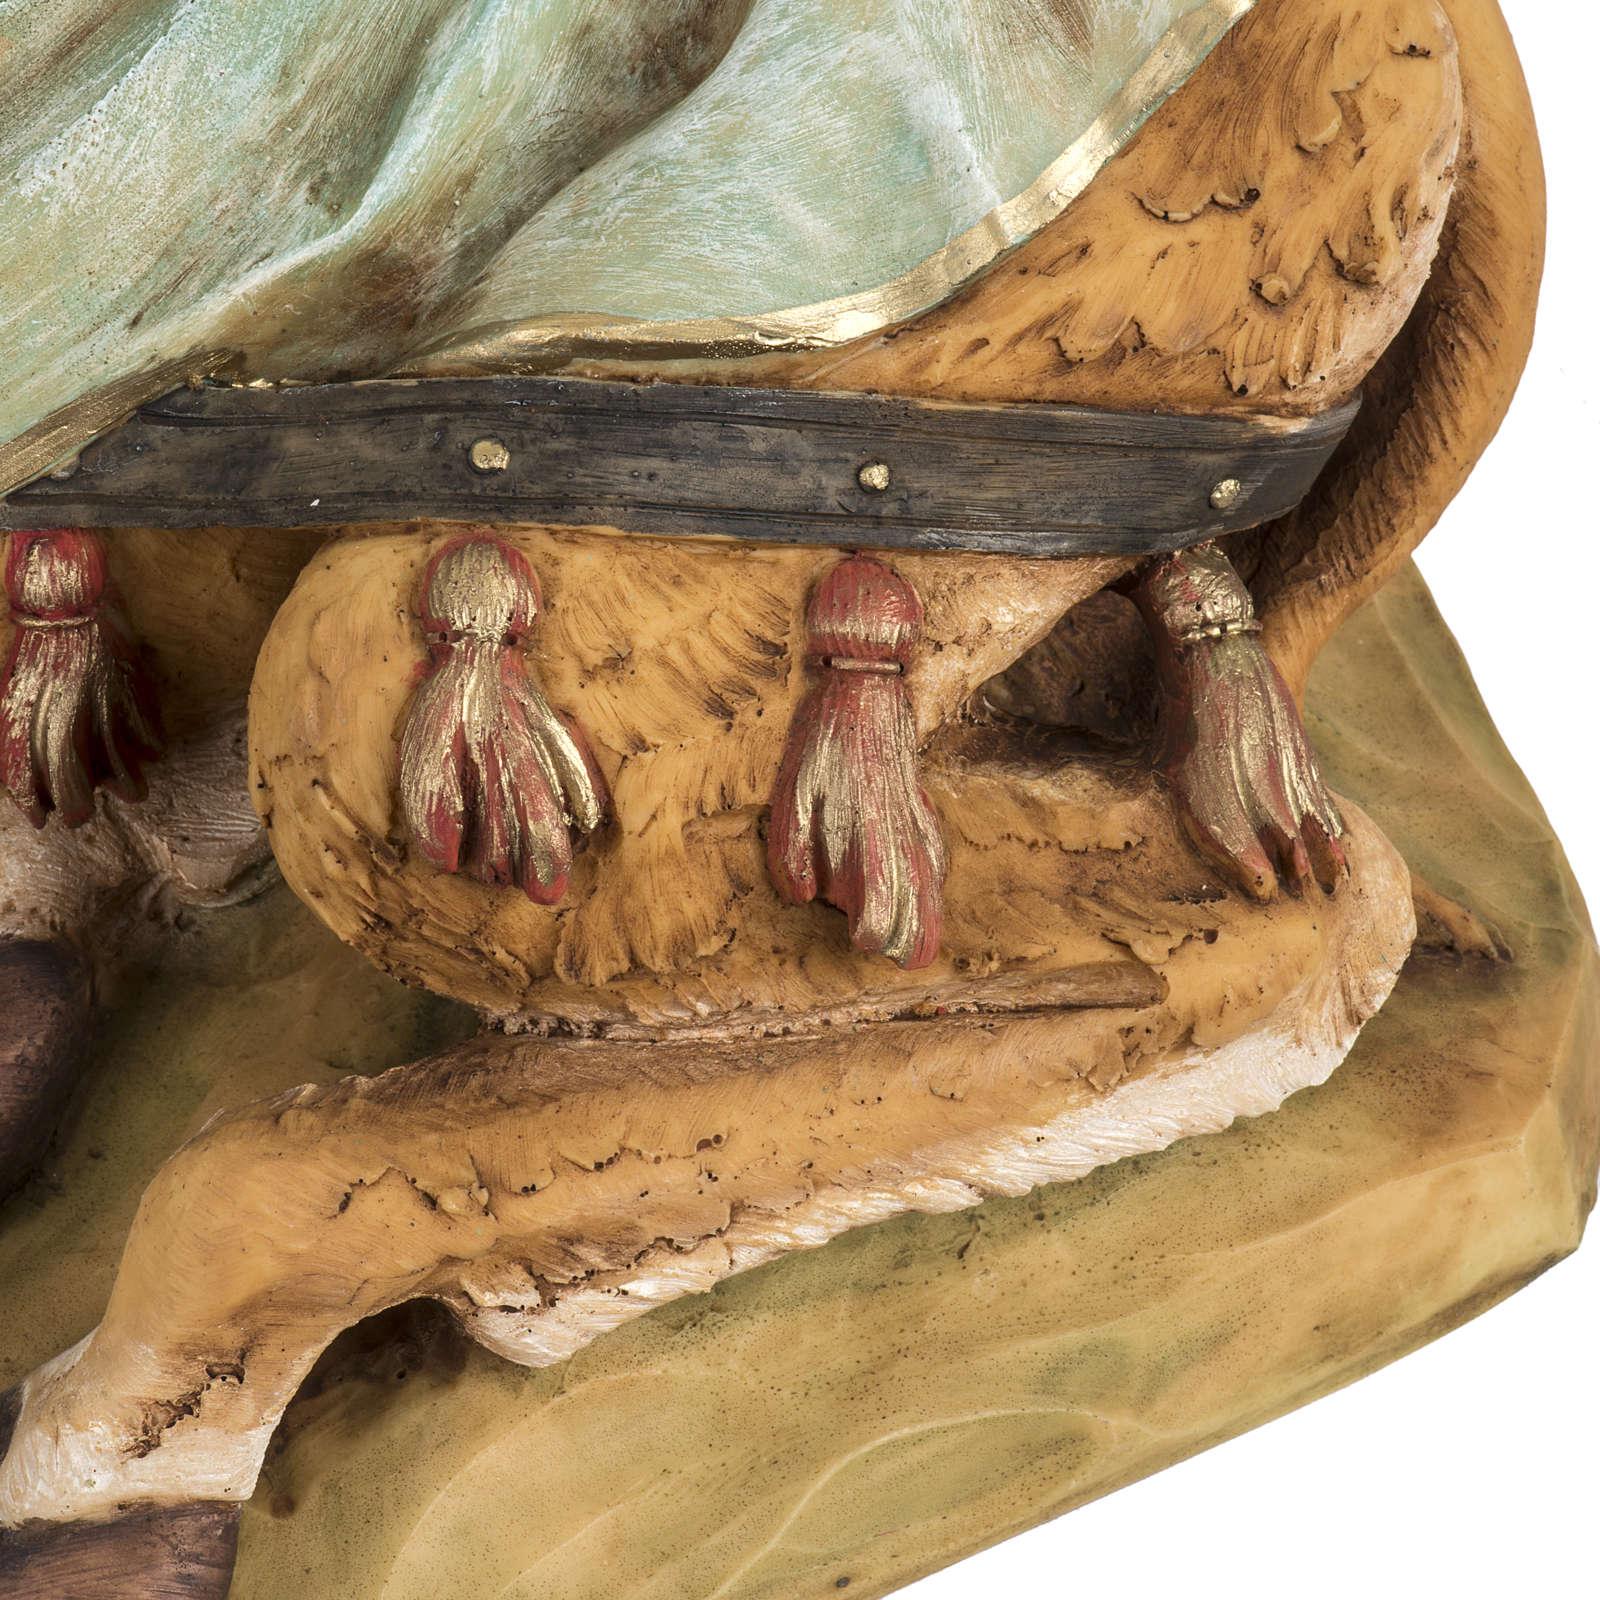 Cammello seduto presepe Fontanini 52 cm 3